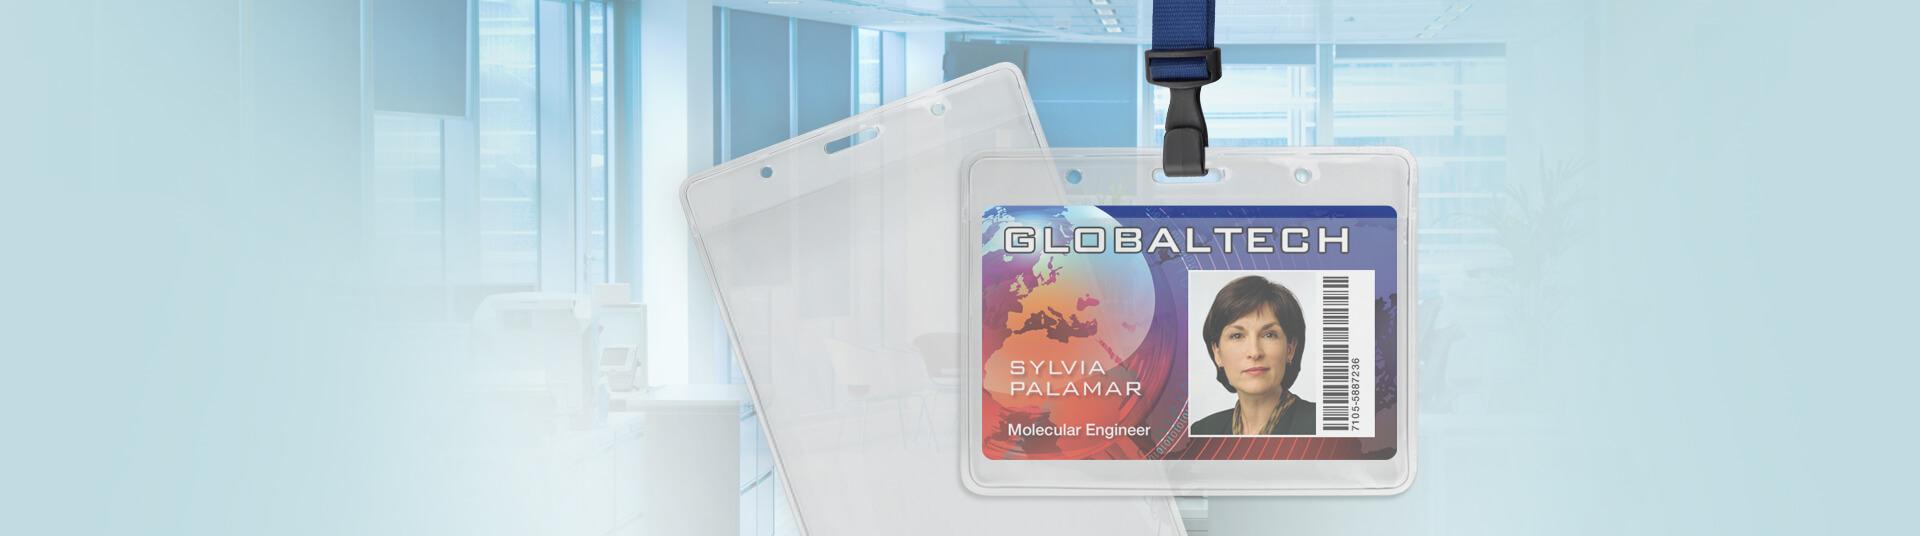 Standard Clear Badge Holders